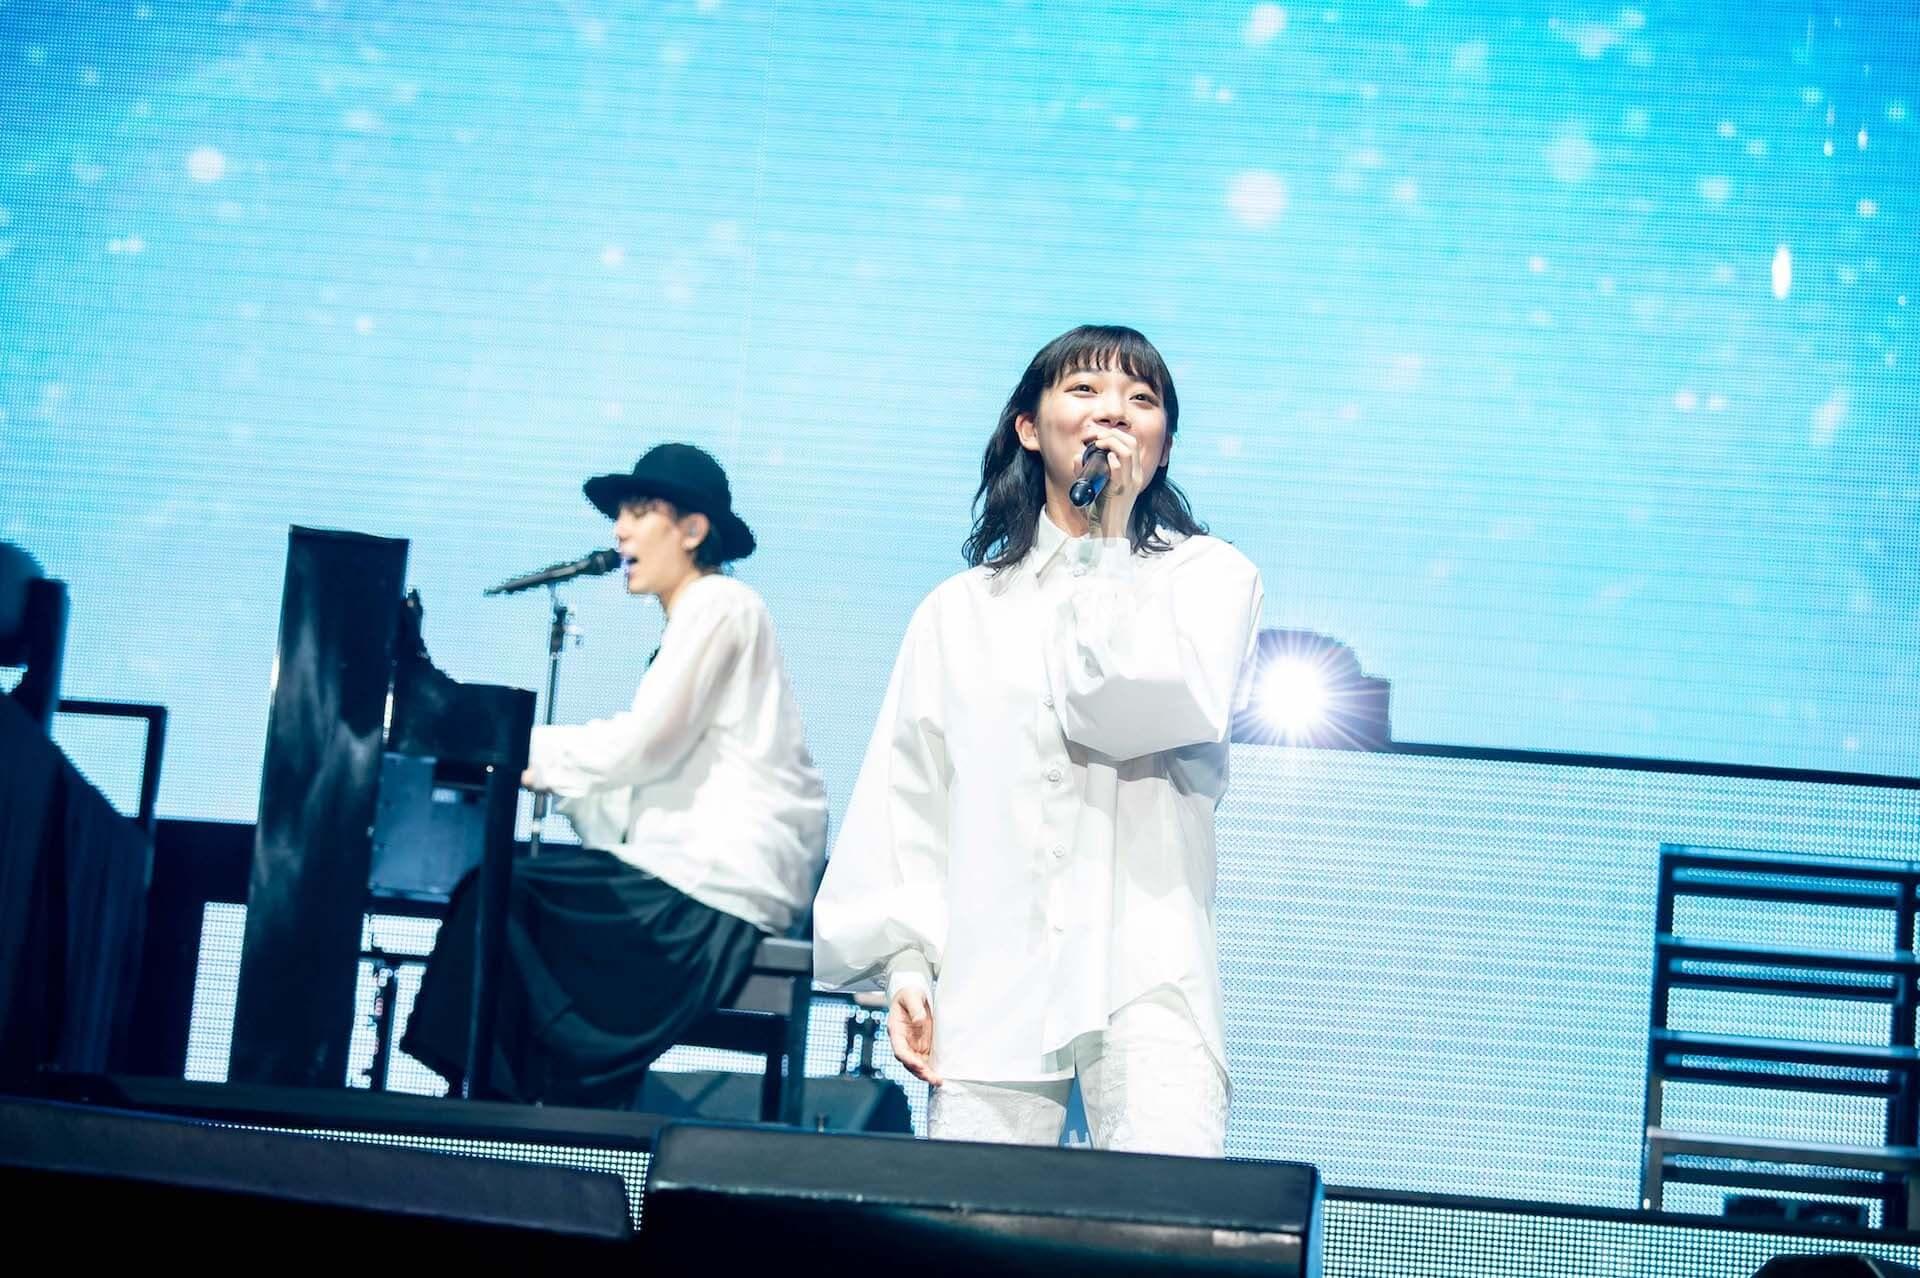 RADWIMPS横浜アリーナ公演のライブ写真が公開!<ANTI ANTI GENERATION TOUR 2019>レポート music190830_radwimps_live_9-1920x1278